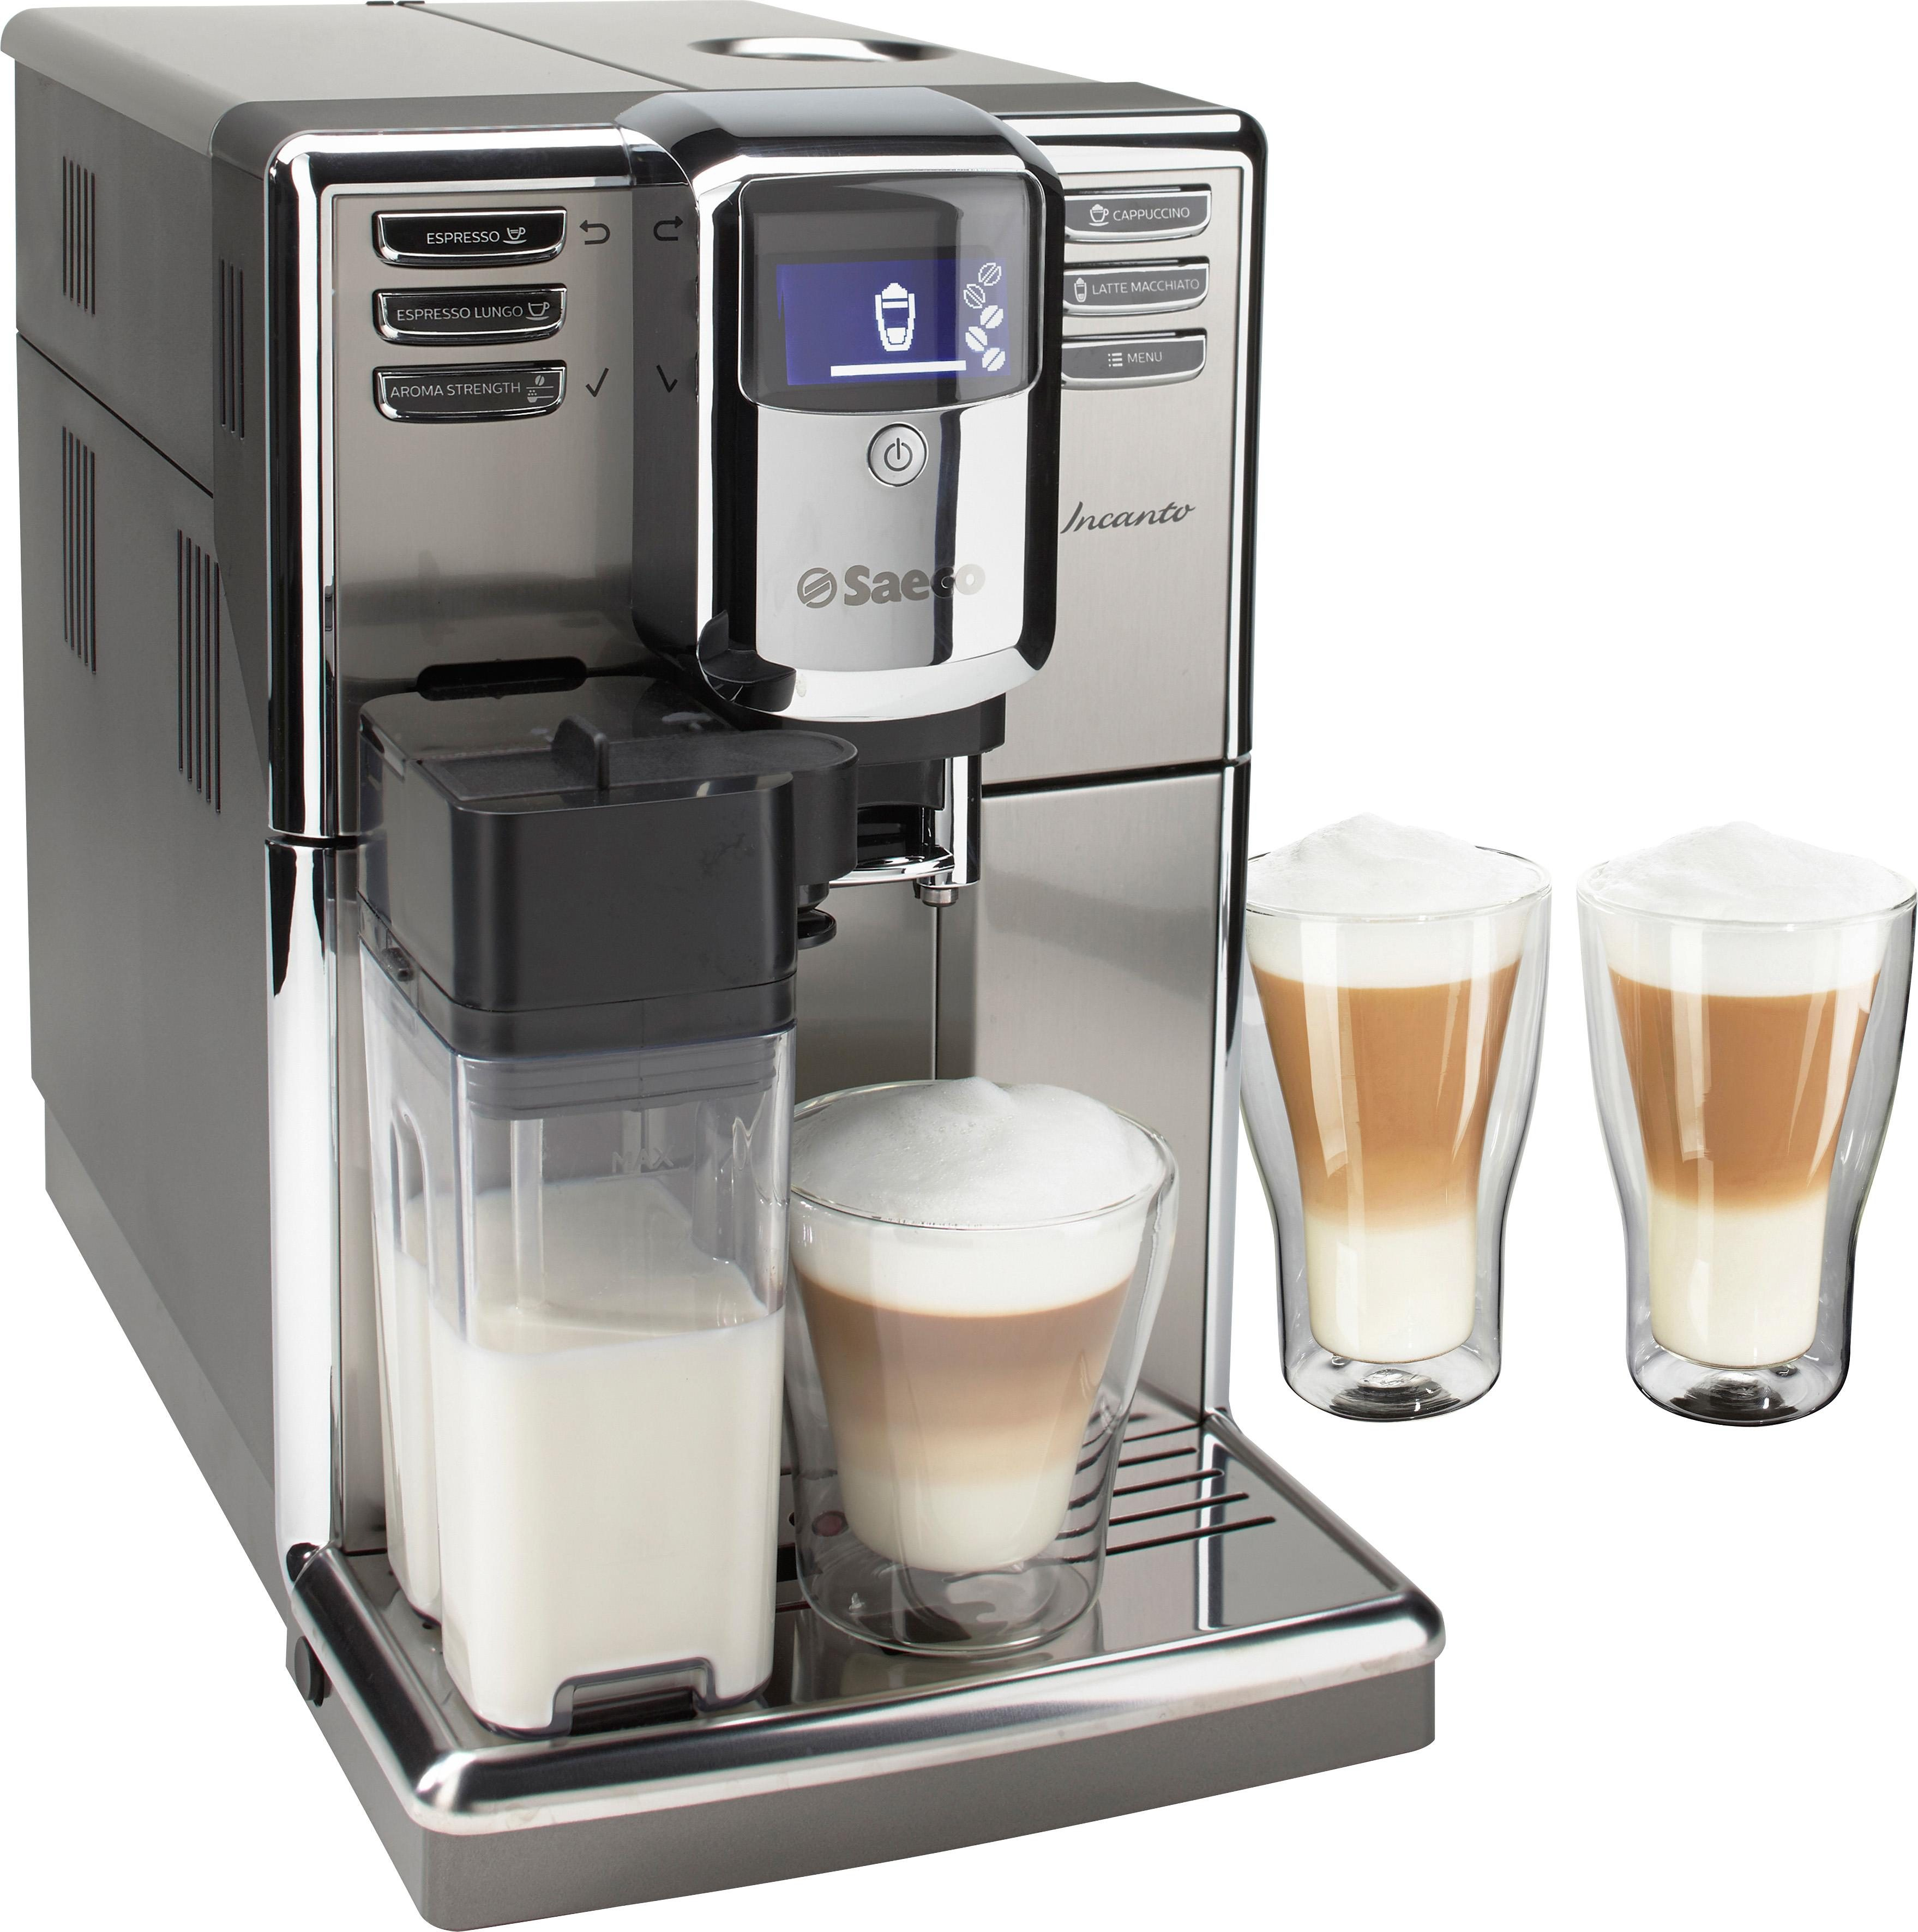 Saeco Kaffeevollautomat HD8917/01 Incanto mit Milchkaraffe, inkl. 2x Latte Macchiato Gläser